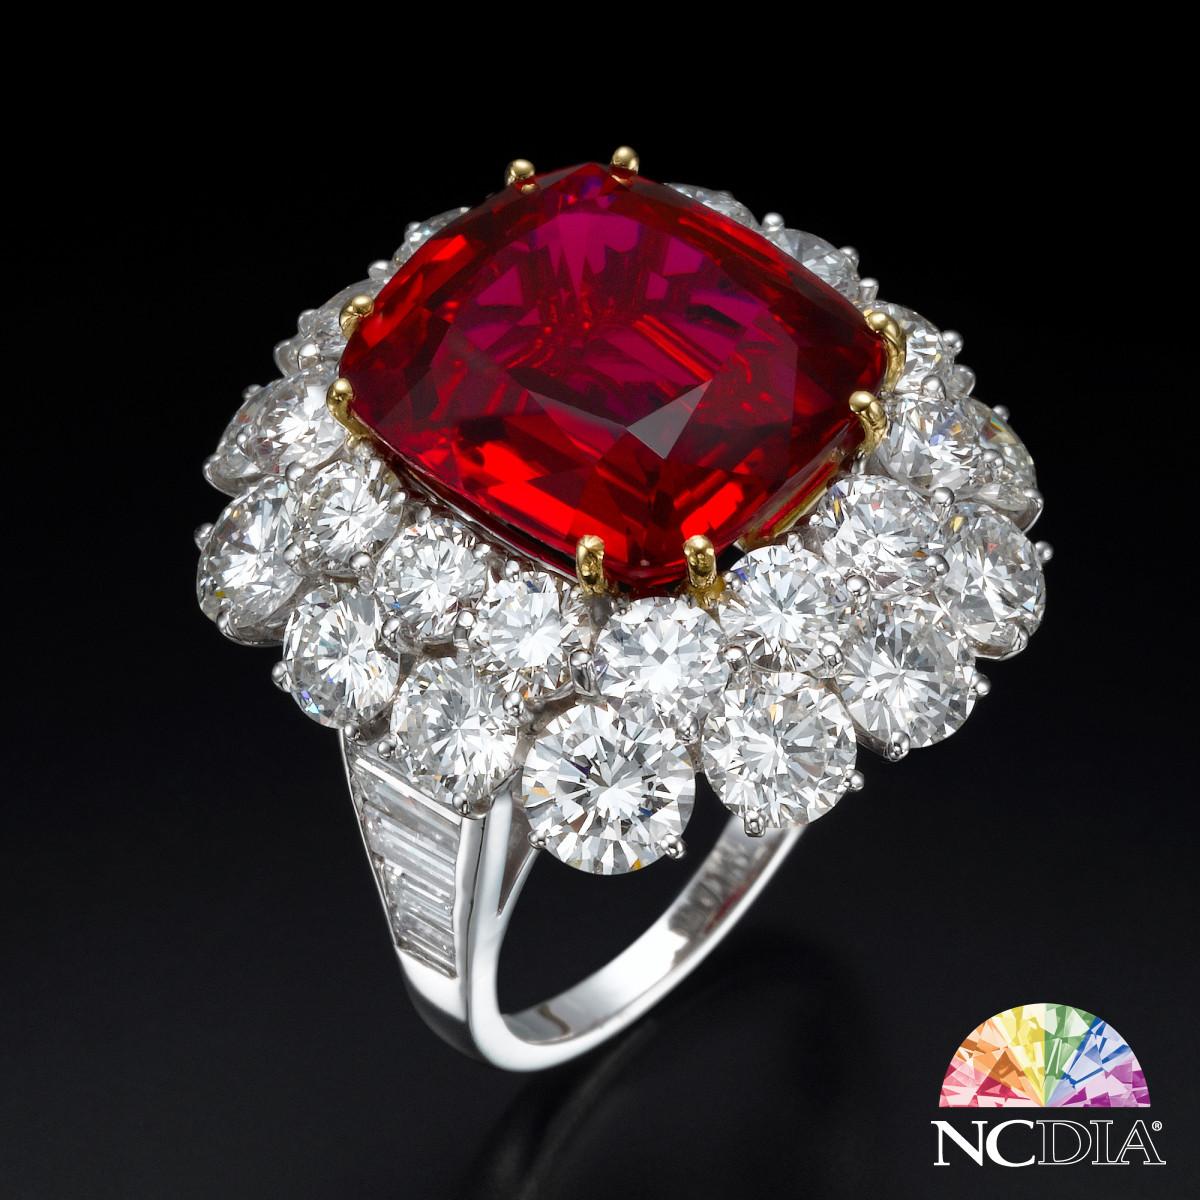 14ct Cushion Cut Thai Ruby Diamond Ring, GUB cert ava.